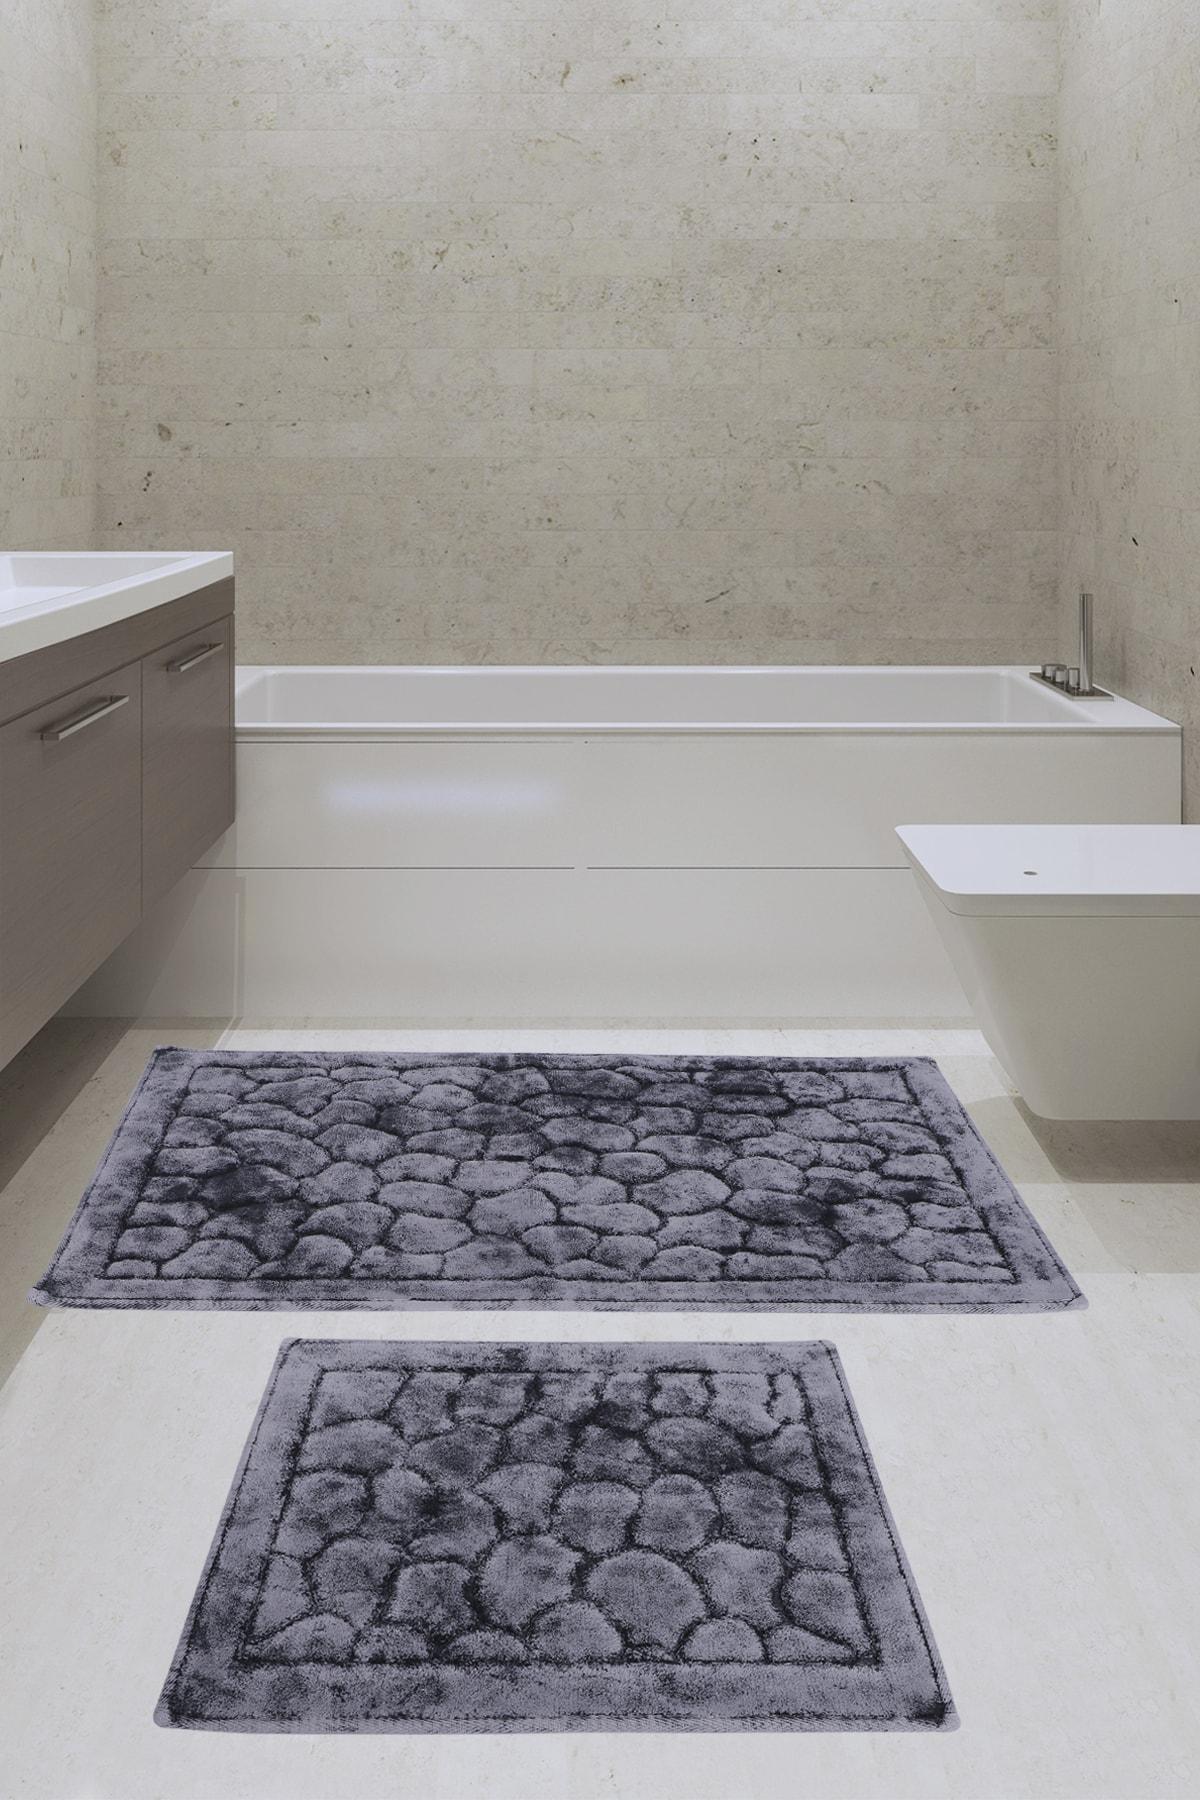 Noble Trade Taş Antrasit 2'li Set Banyo Halısı Paspas Seti 60x100 + 50x60 Cm